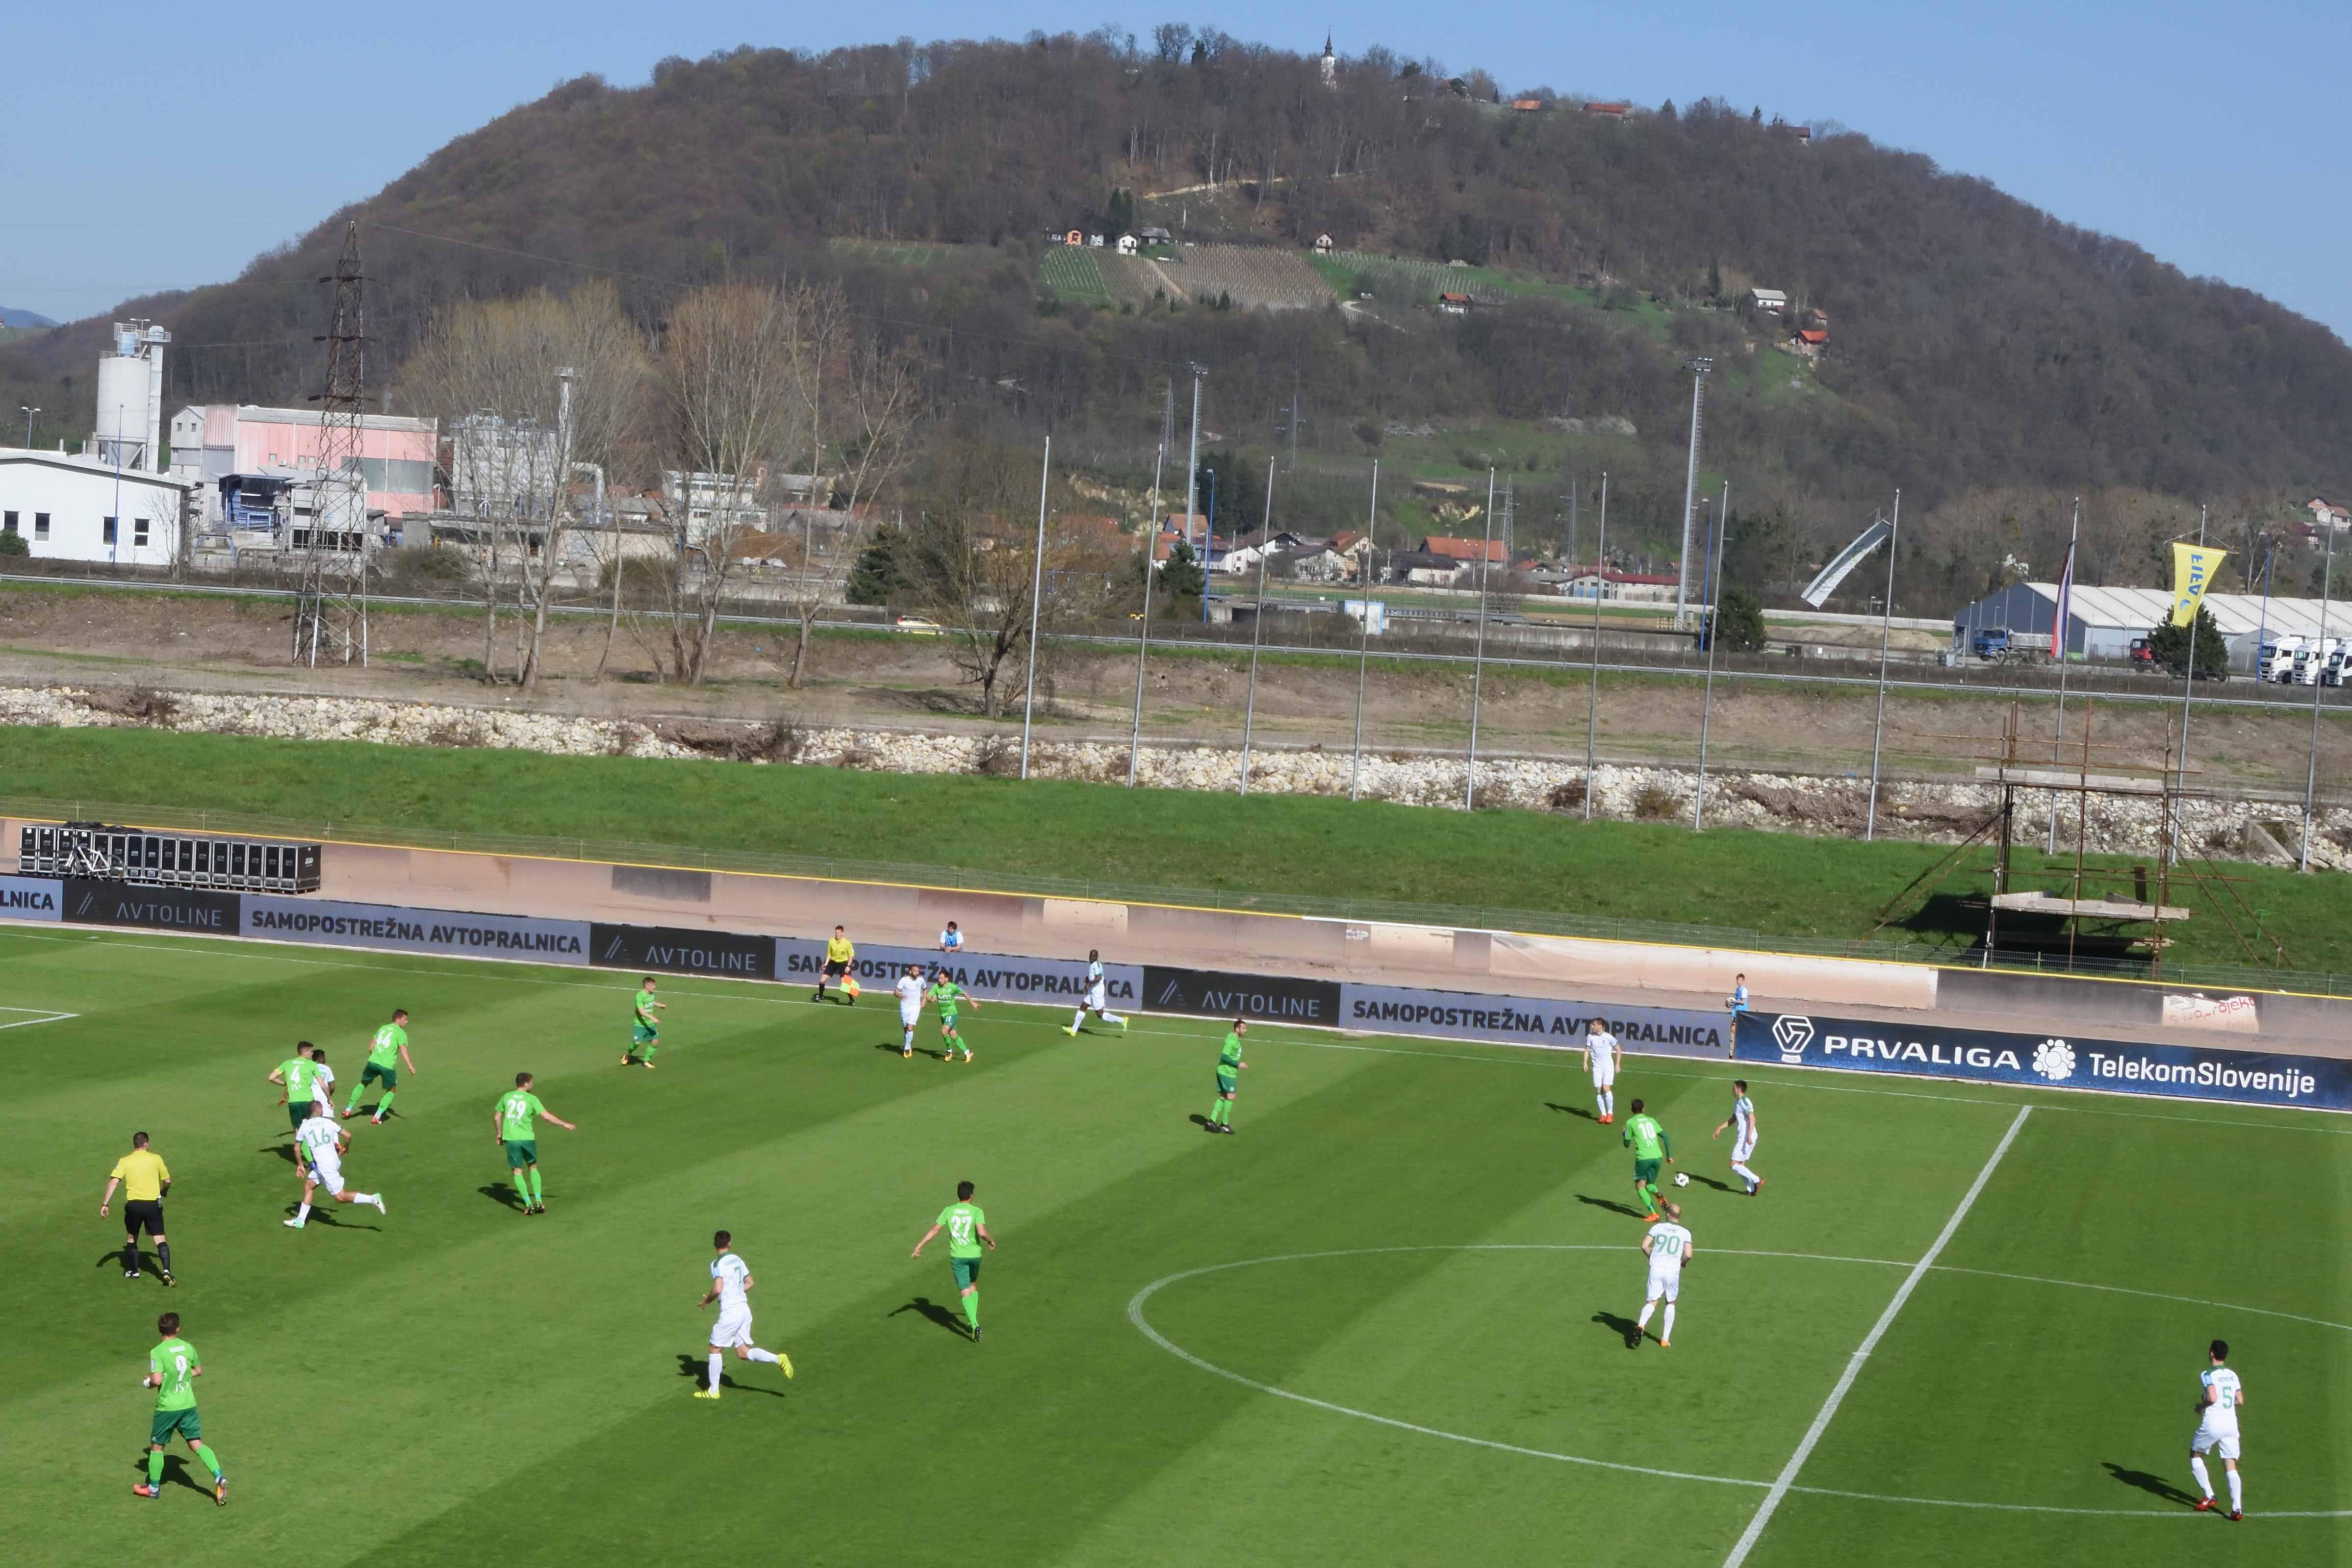 Football Nation 51/55 - Slovenia - Krško 0-1 Olimpija Ljubljana